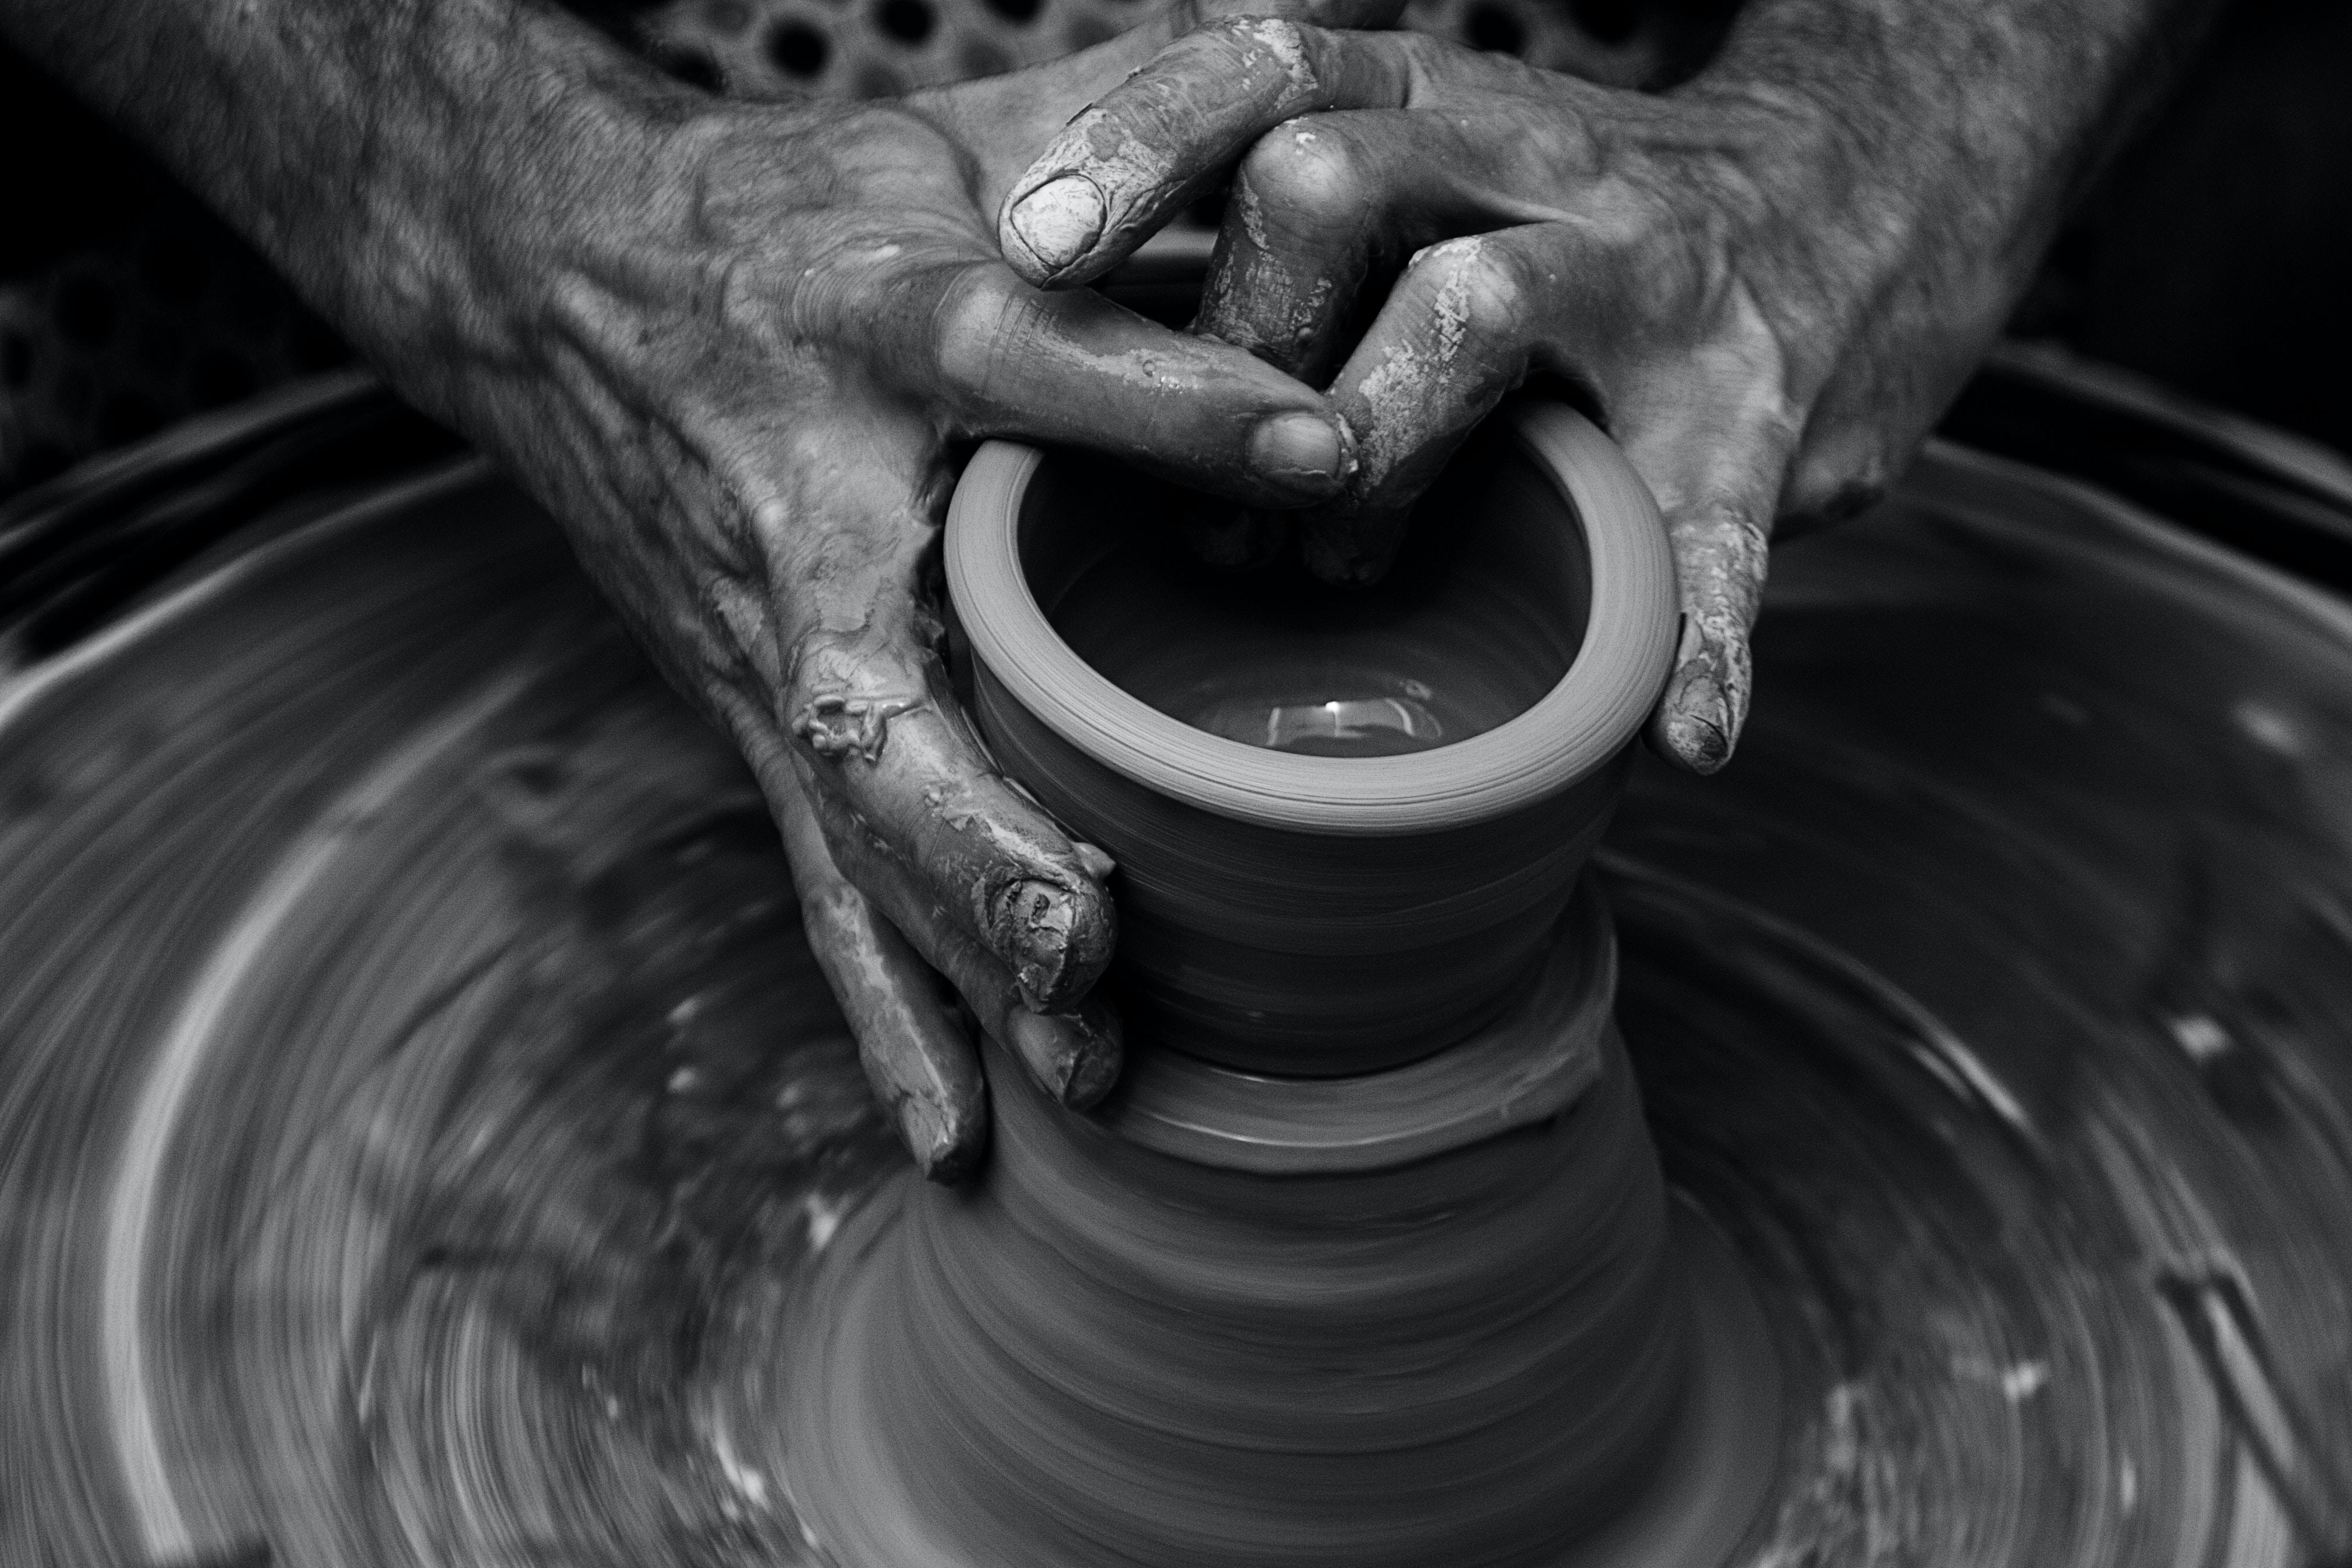 Pottery wheel photo by Quino Al (@quinoal) on Unsplash